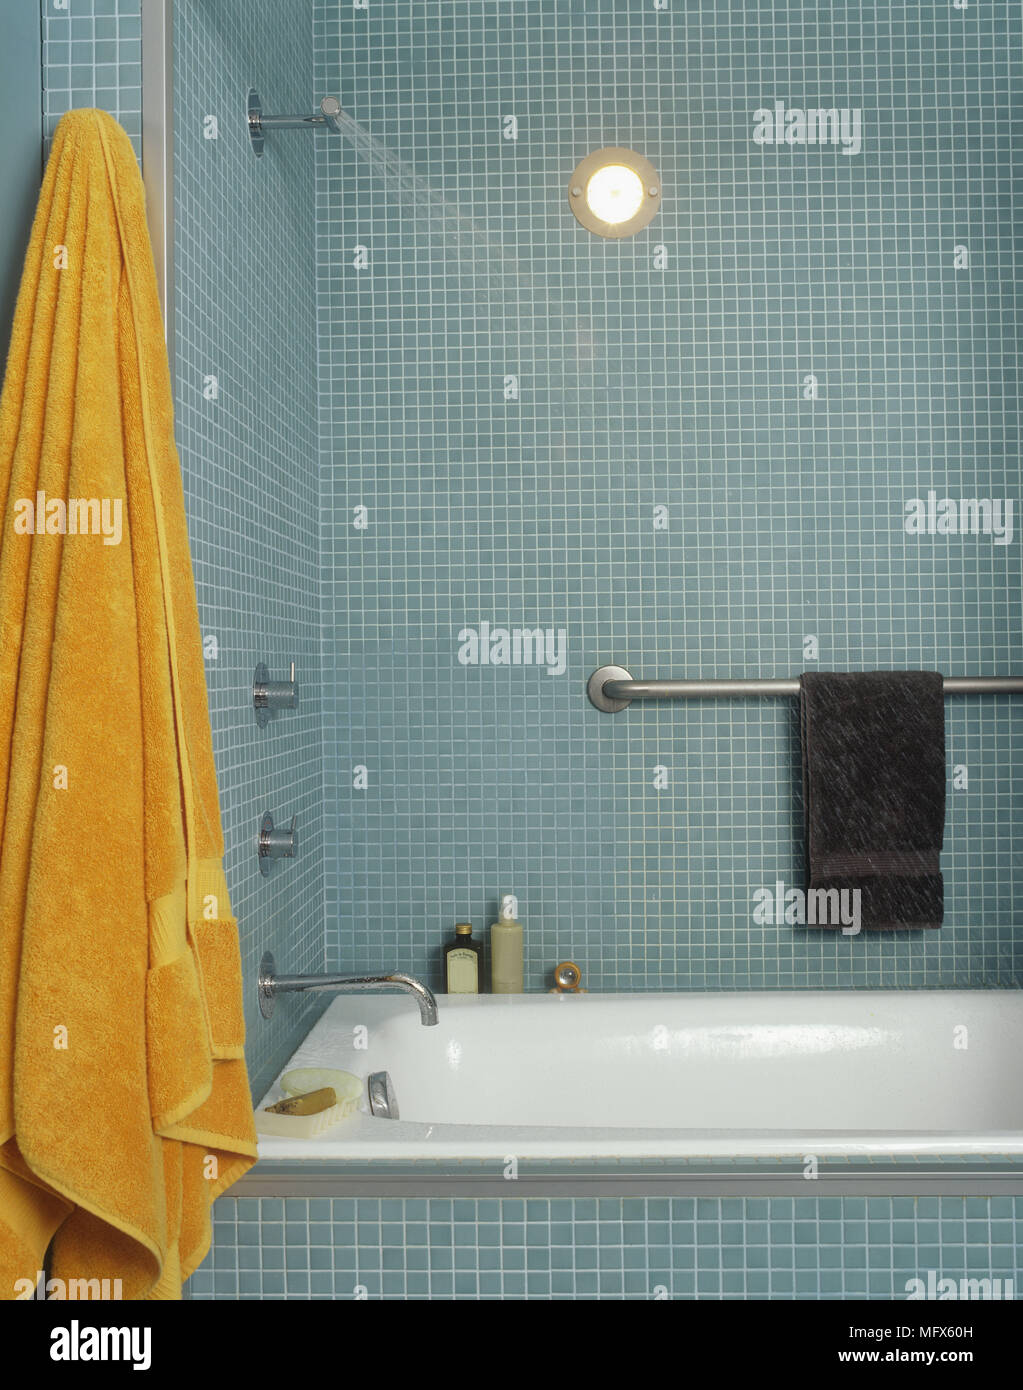 A modern blue bathroom tiled walls with mosaic tiles bath chrome tap ...